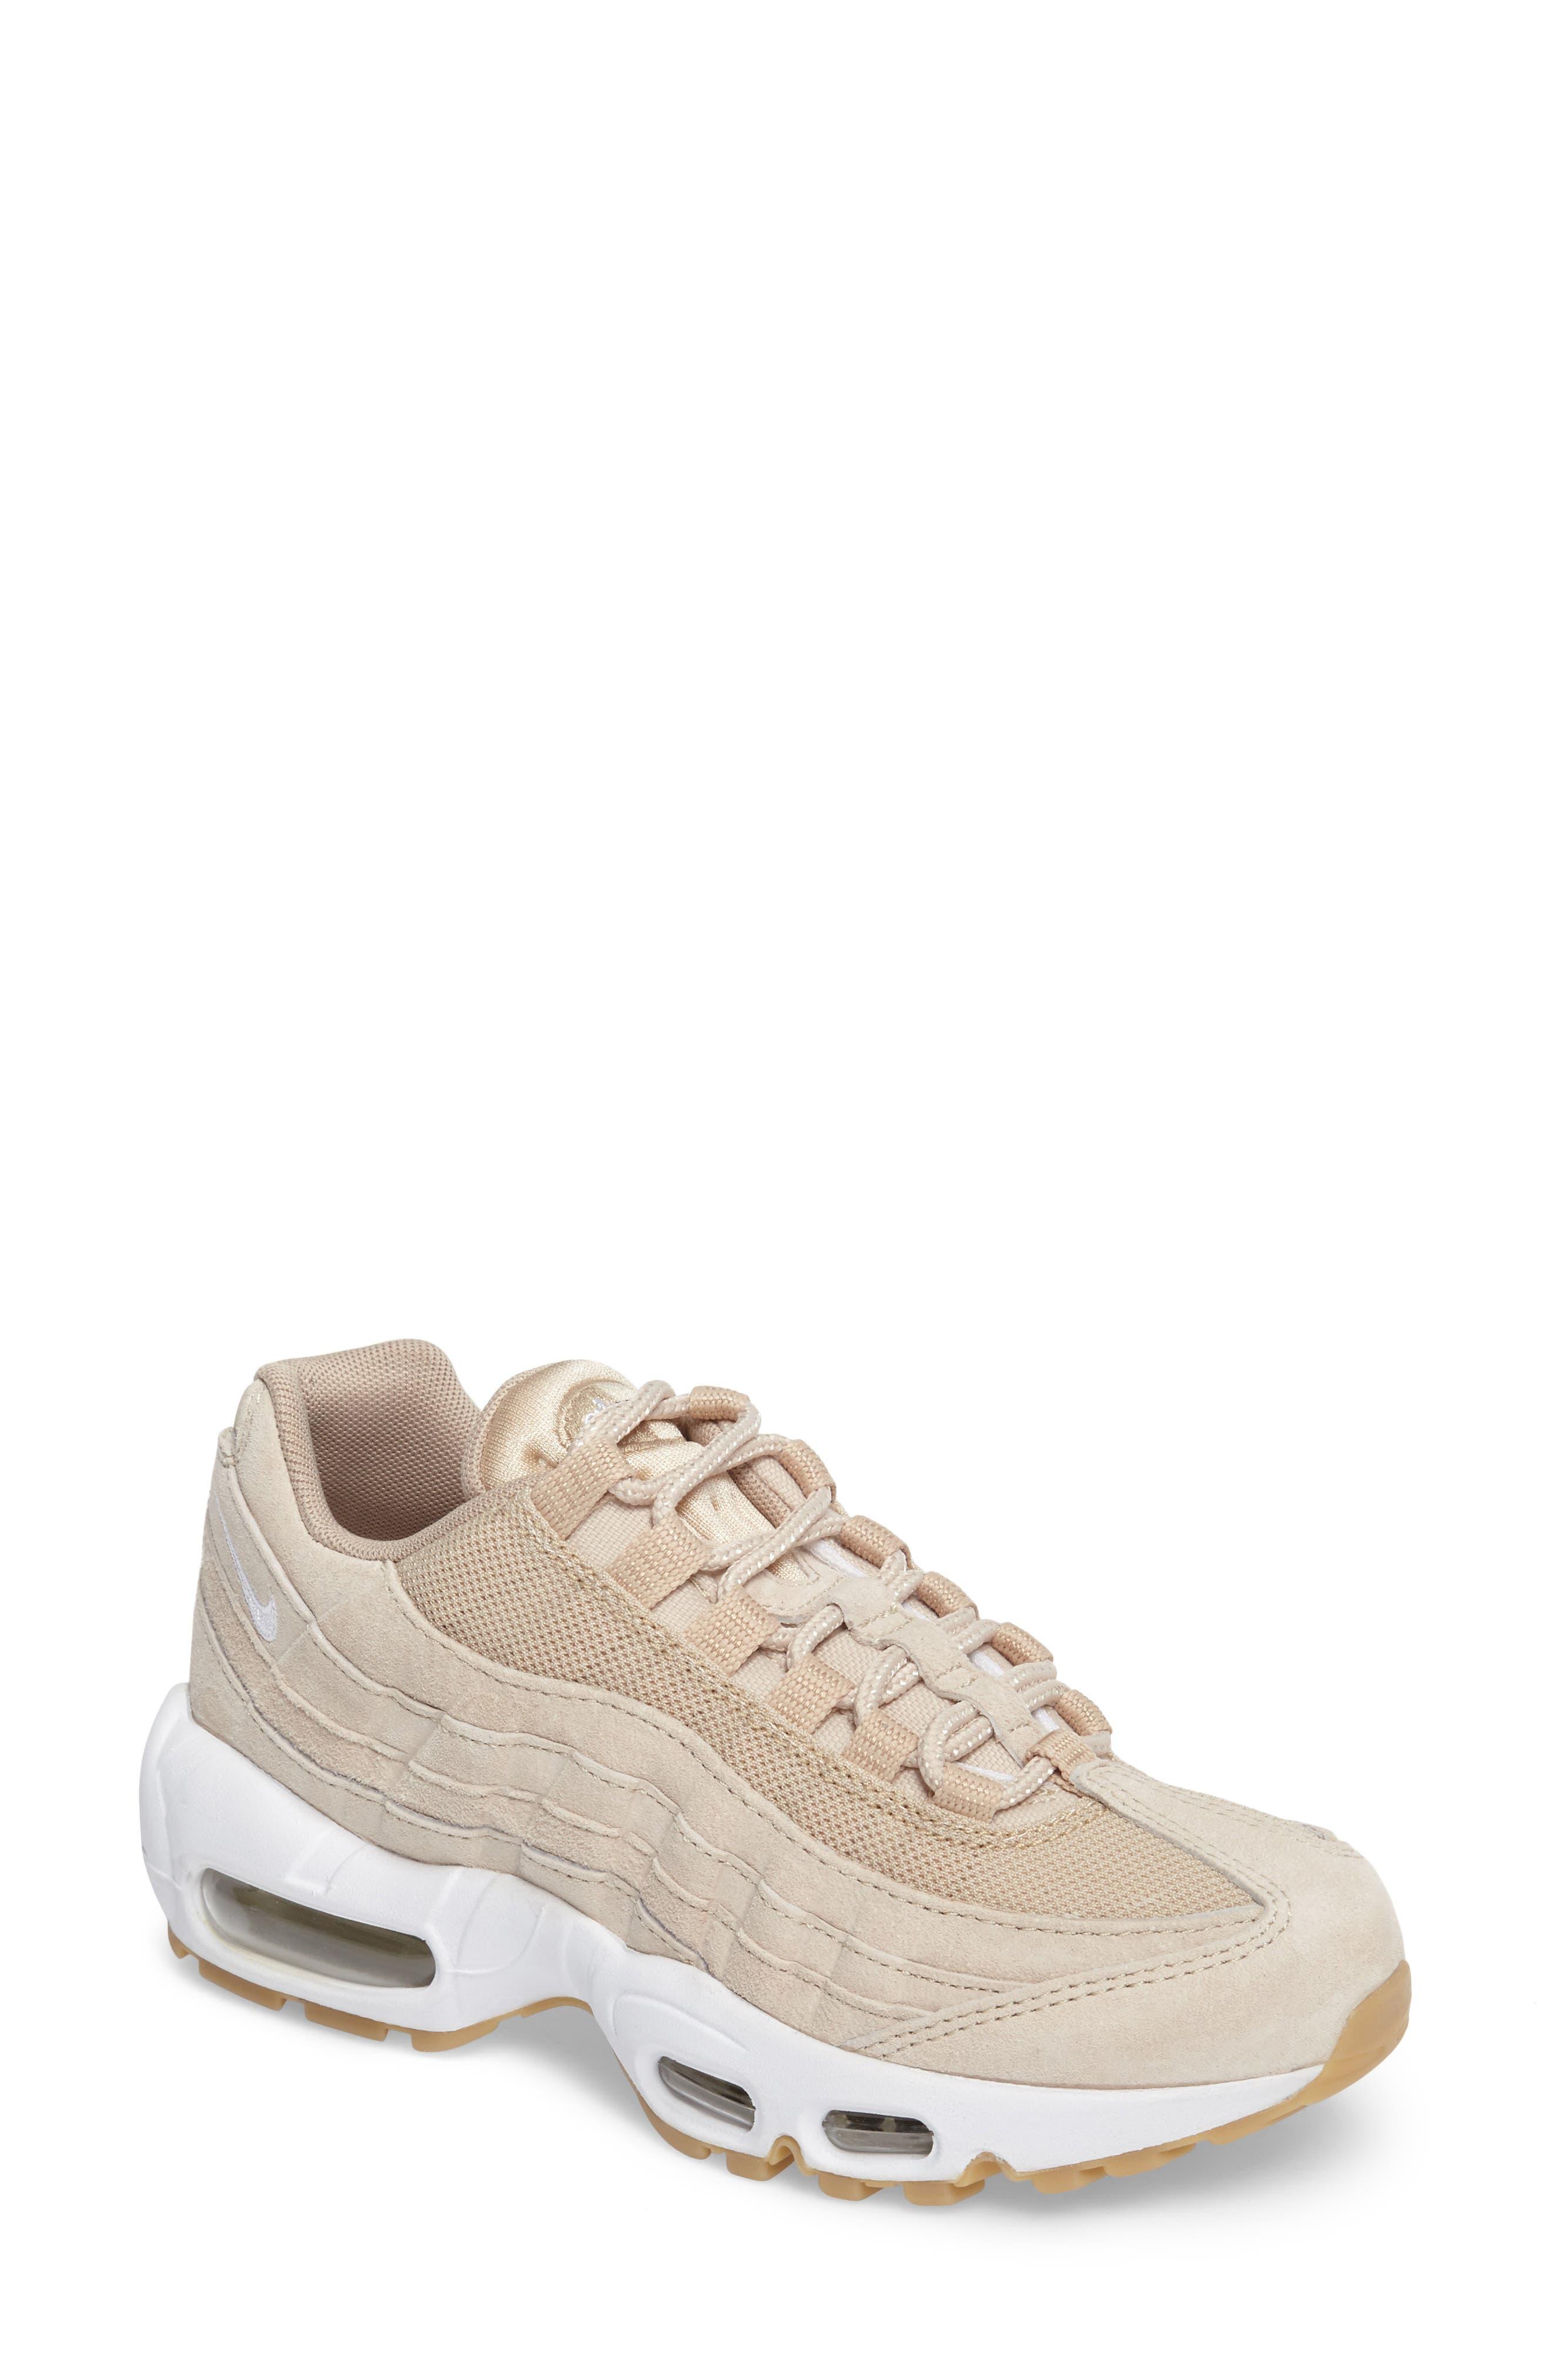 Air Max 95 SD Sneaker,                             Main thumbnail 1, color,                             250